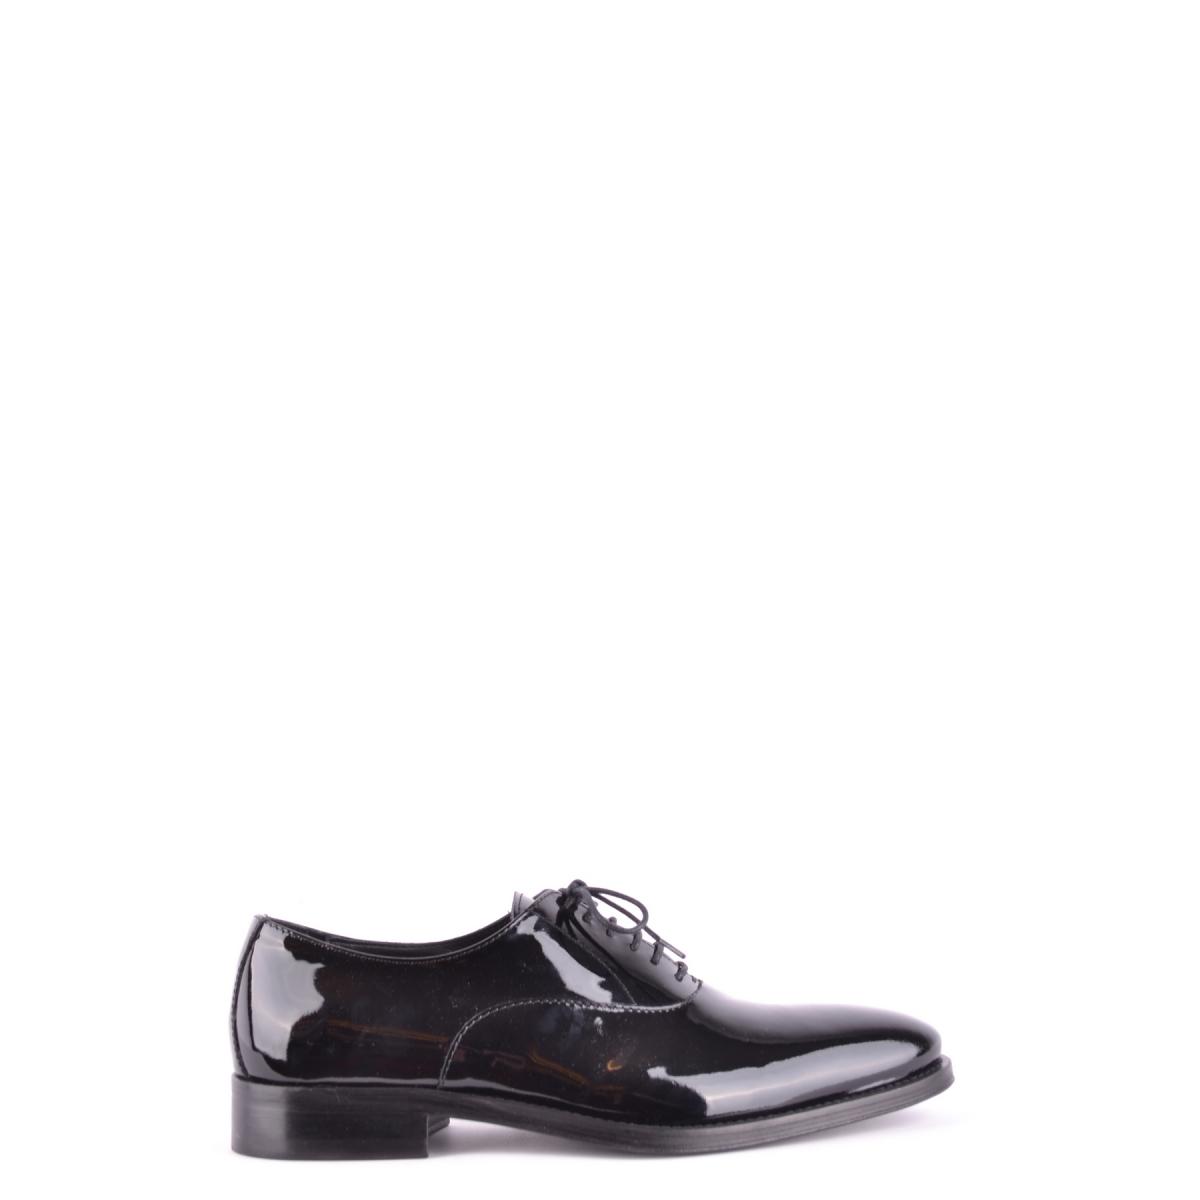 Billig gute Qualität Schuhe Brian Dales 32979DE -20%